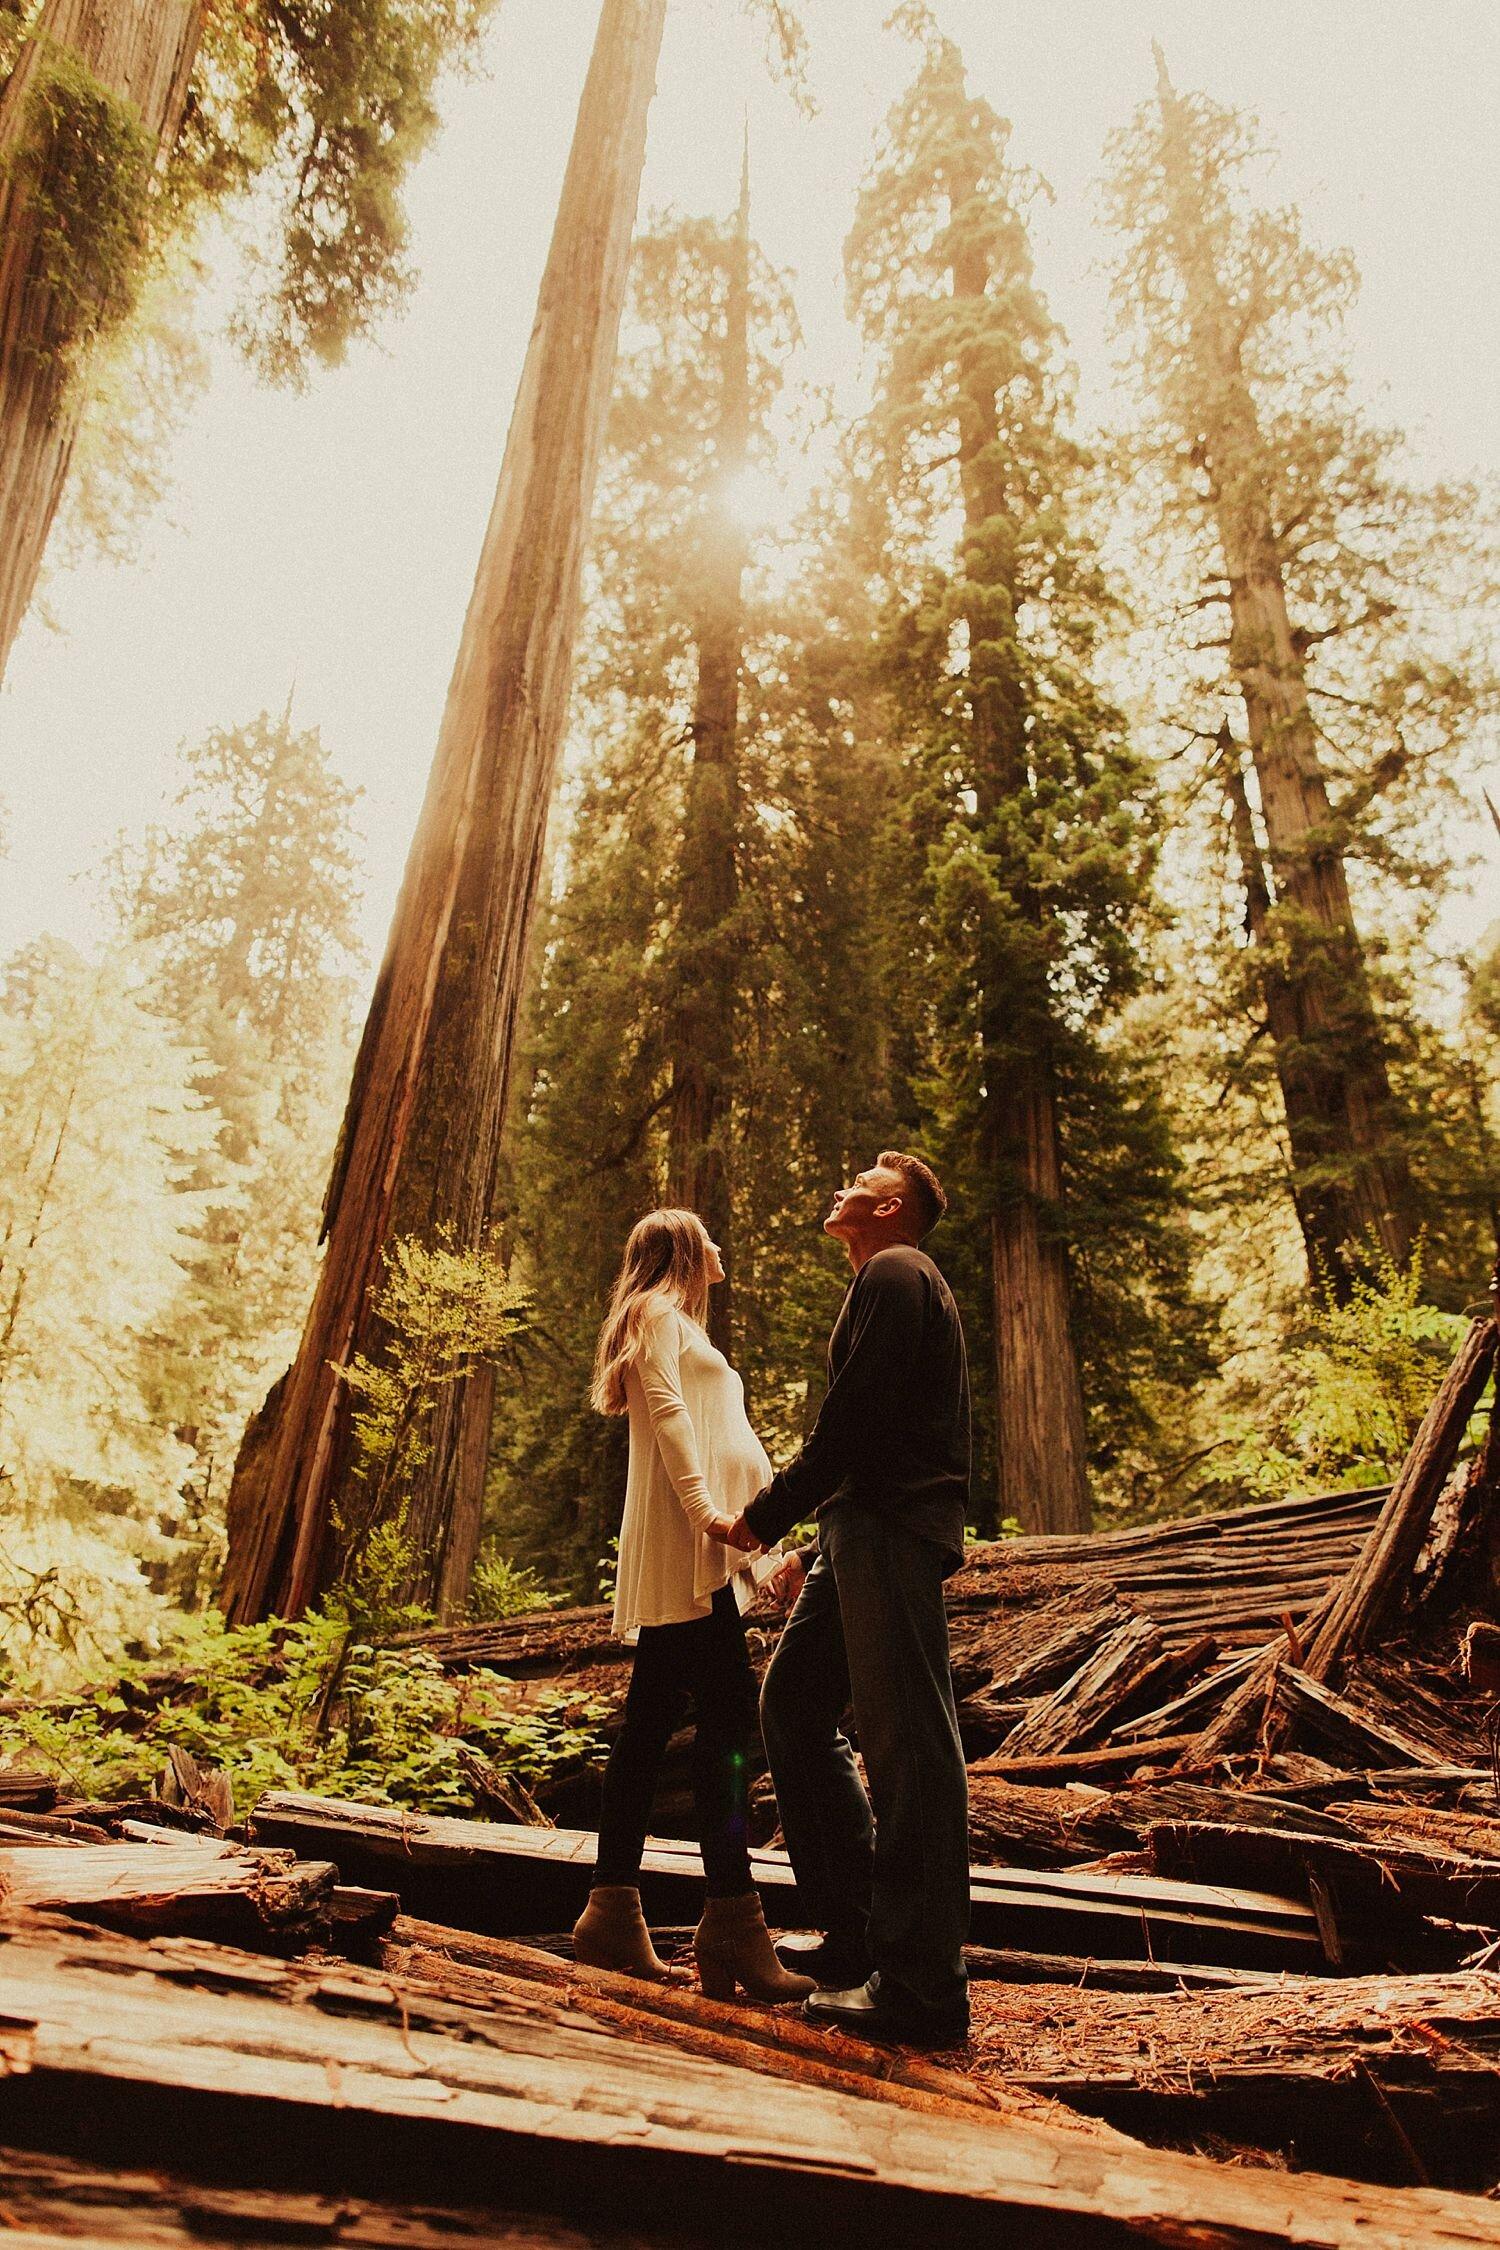 redwoods-california-maternity-photos_4329.jpg